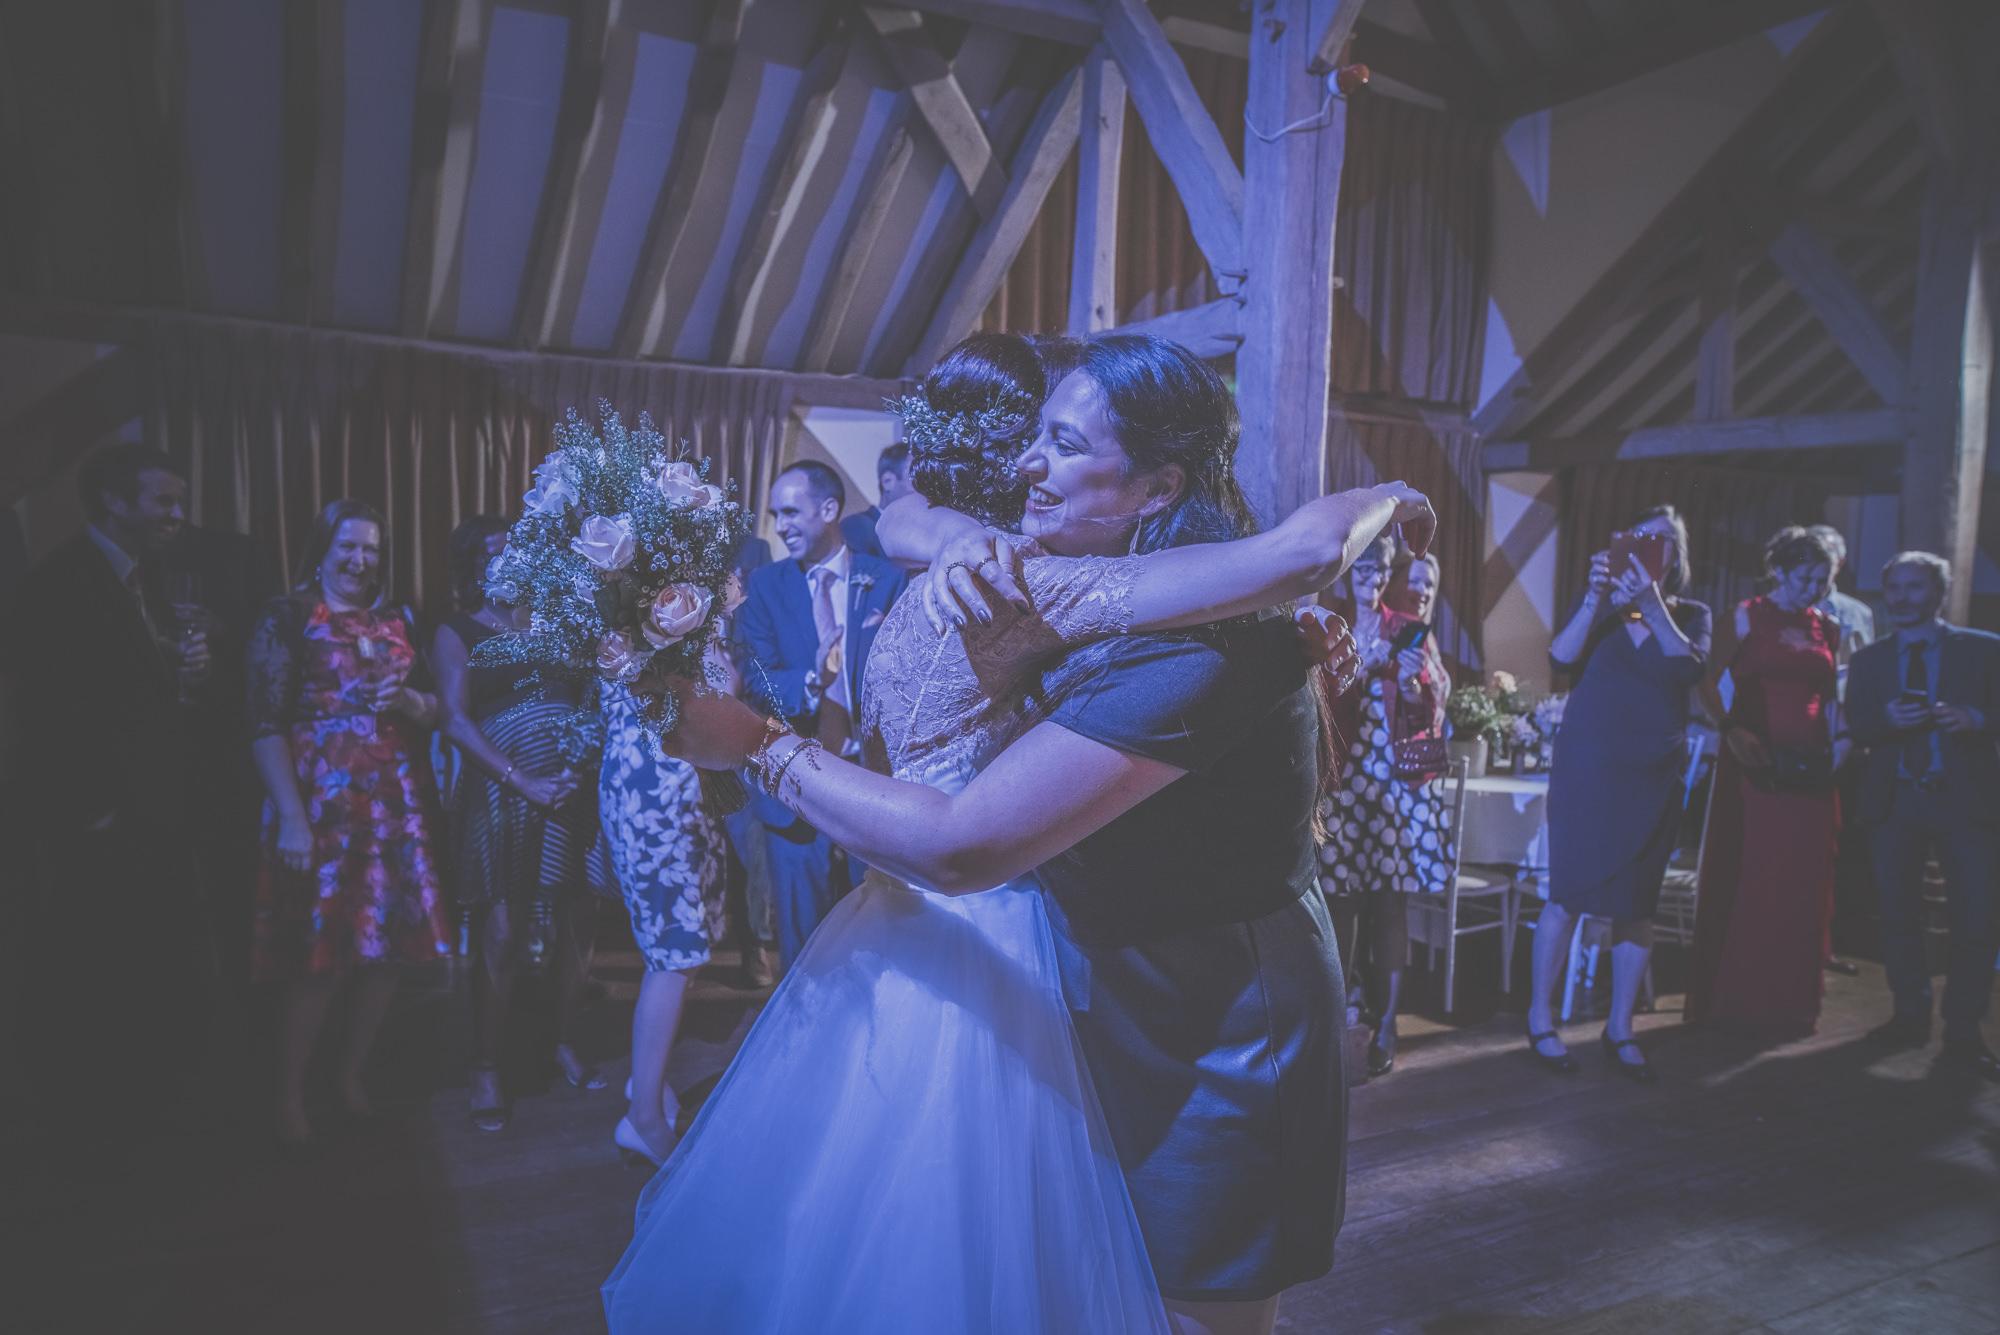 Charisse-and-James-wedding-in-Cain-Manor-Venue-Hampshire-Manu-Mendoza-Wedding-Photography-551.jpg